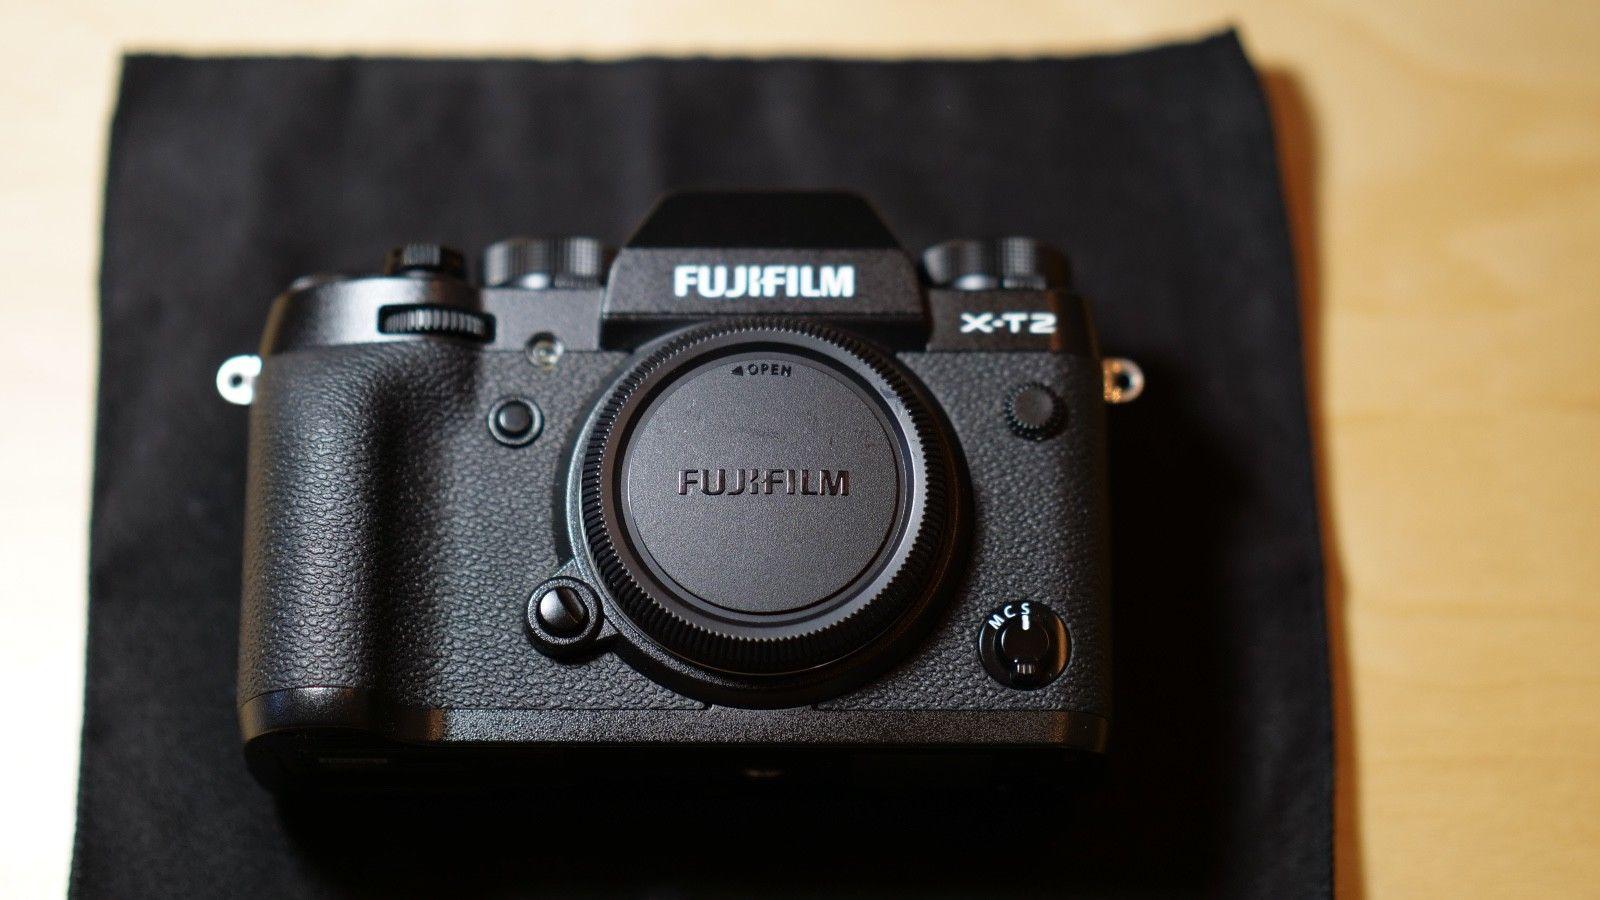 Fujifilm X-T2 24.3MP Digitalkamera - Schwarz ohne Objektiv